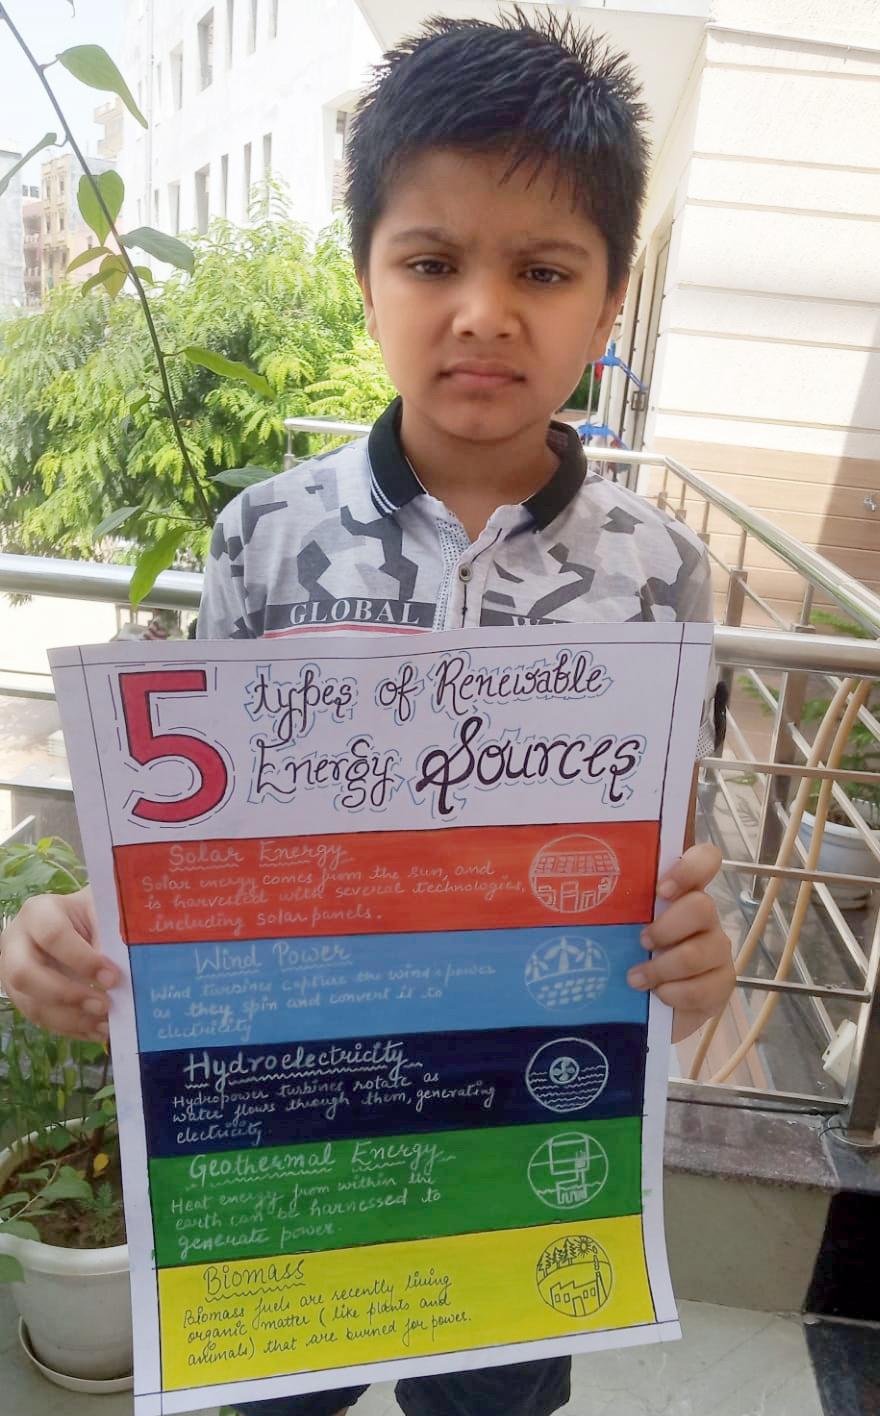 AKSHAY URJA DIWAS: PRESIDIANS JOIN HANDS TO CONSERVE ENERGY!